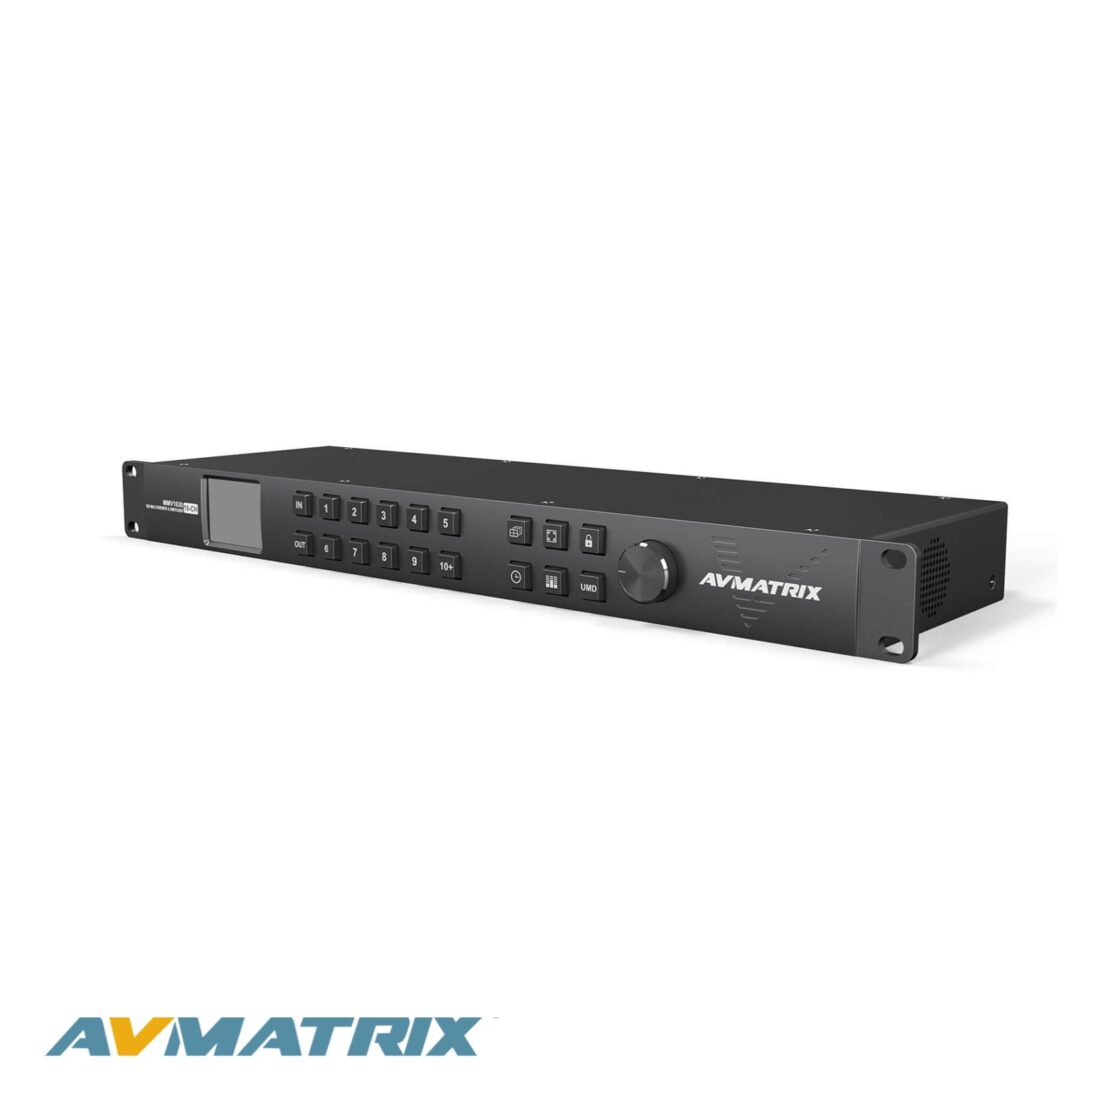 AVMatrix MMV1630